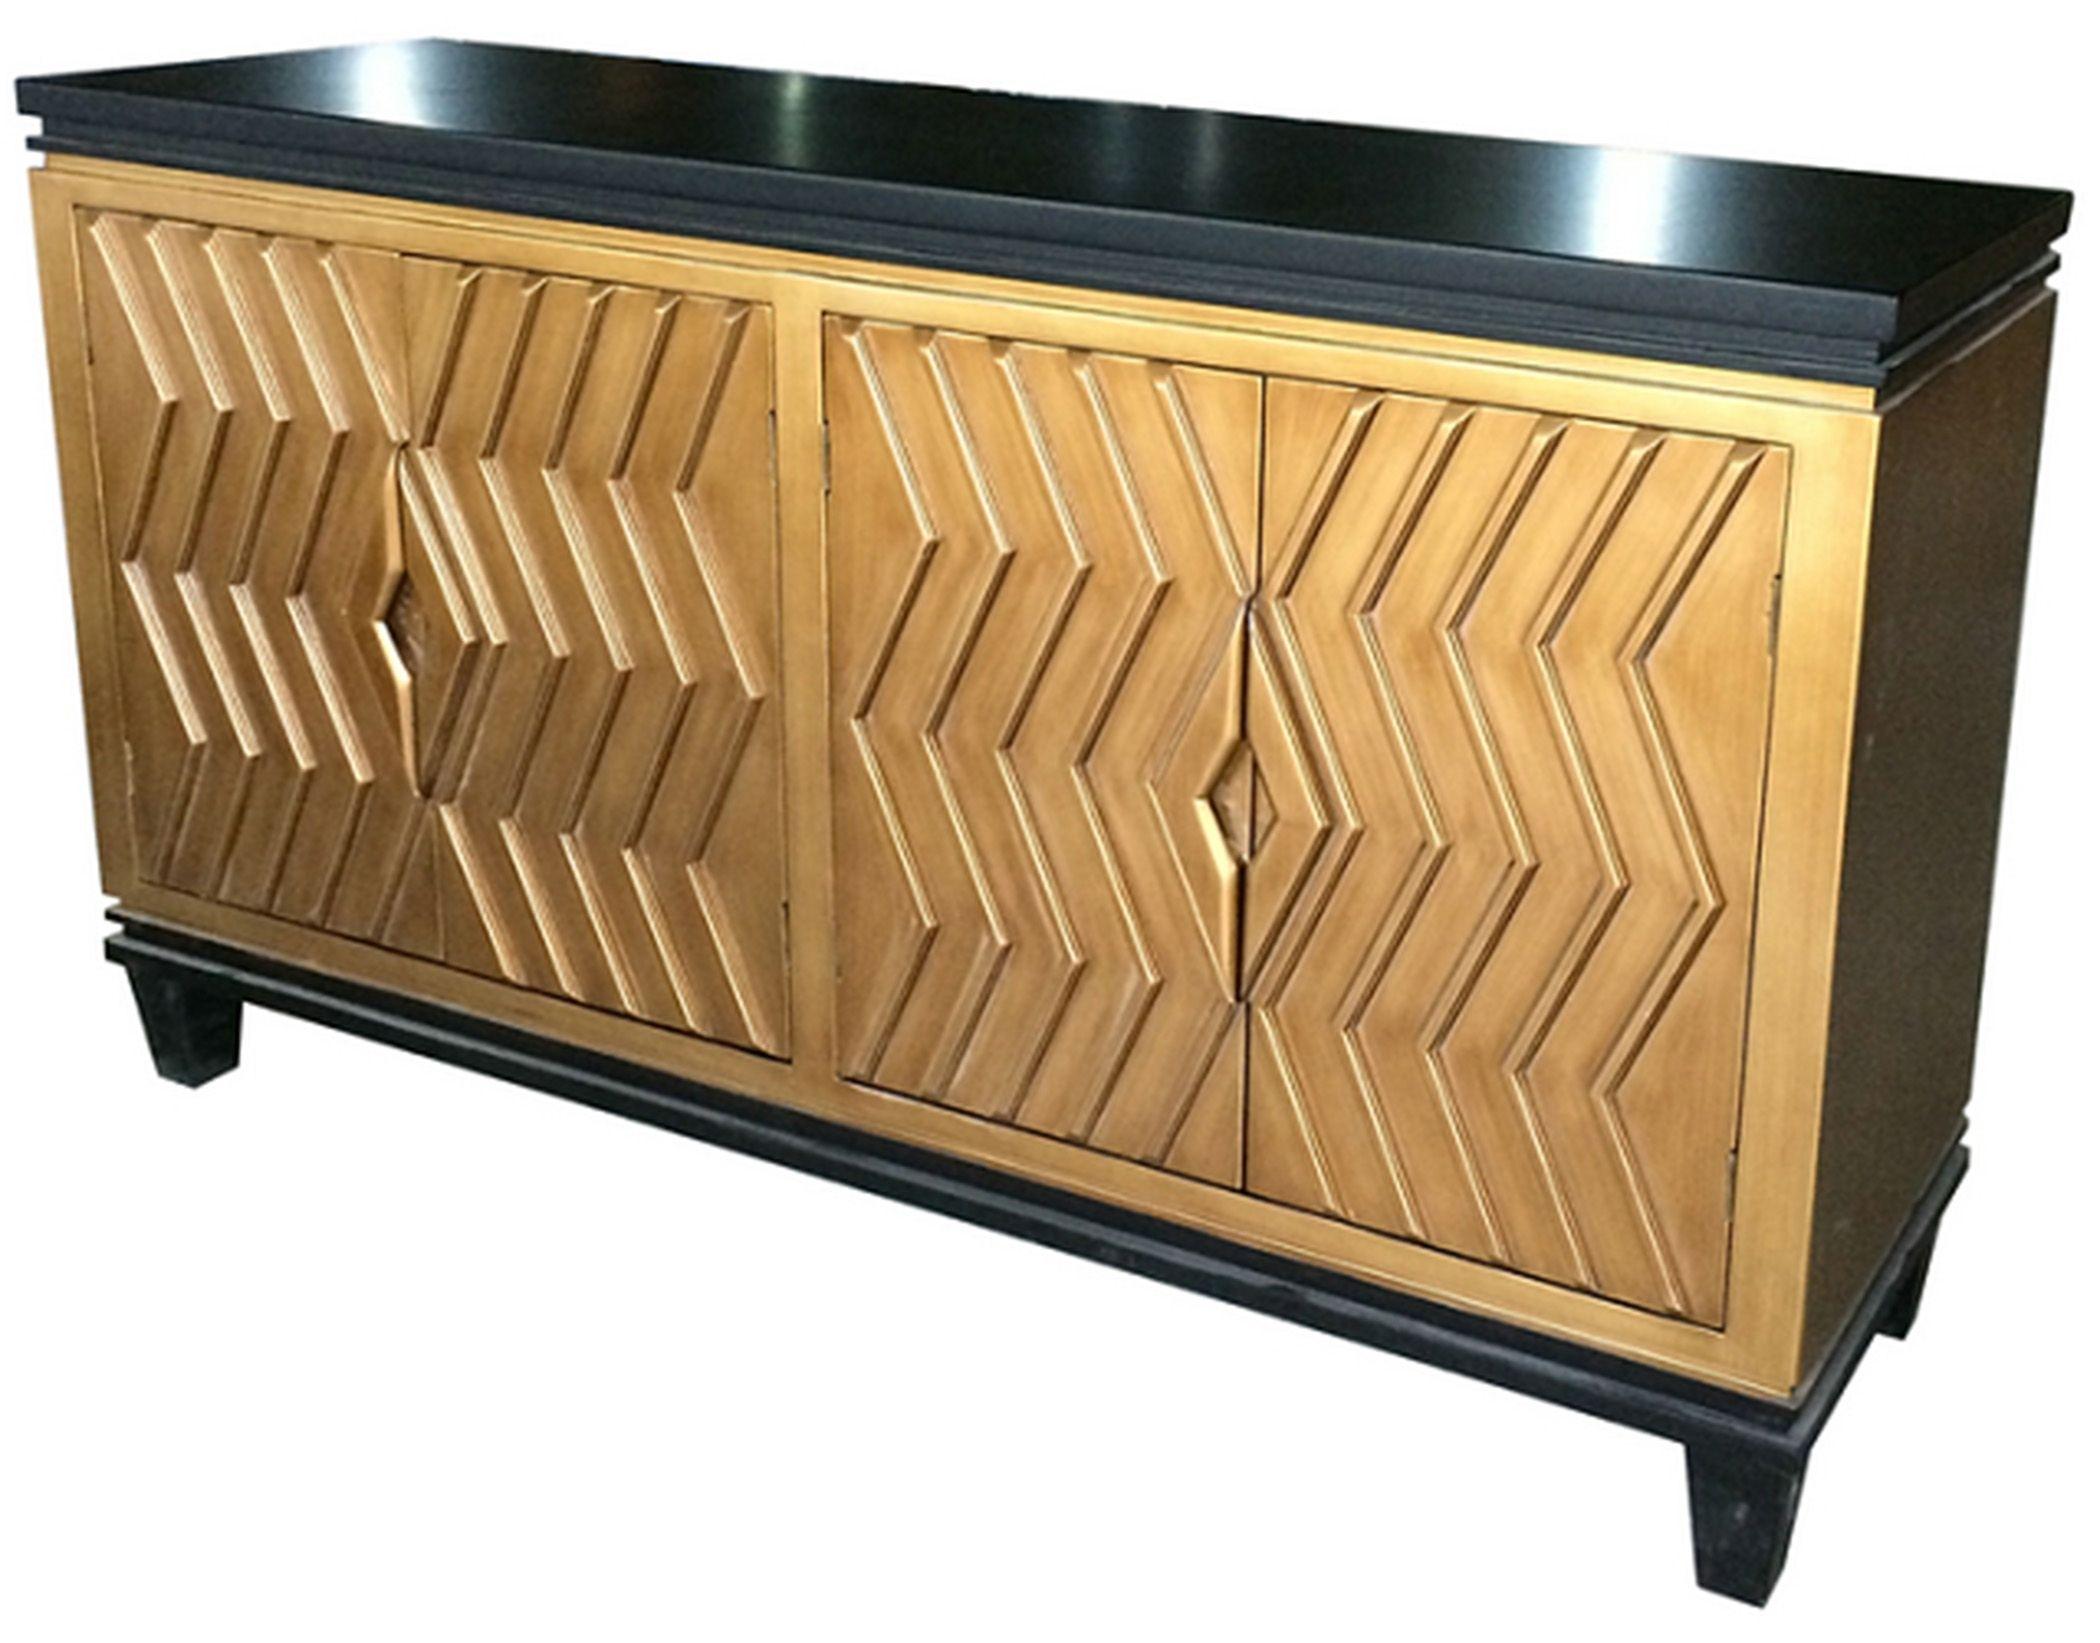 Alessio Art Deco Sideboard 4 Doors, Black/gold Material: Mdf Inside 2017 Brown Chevron 4 Door Sideboards (#2 of 20)